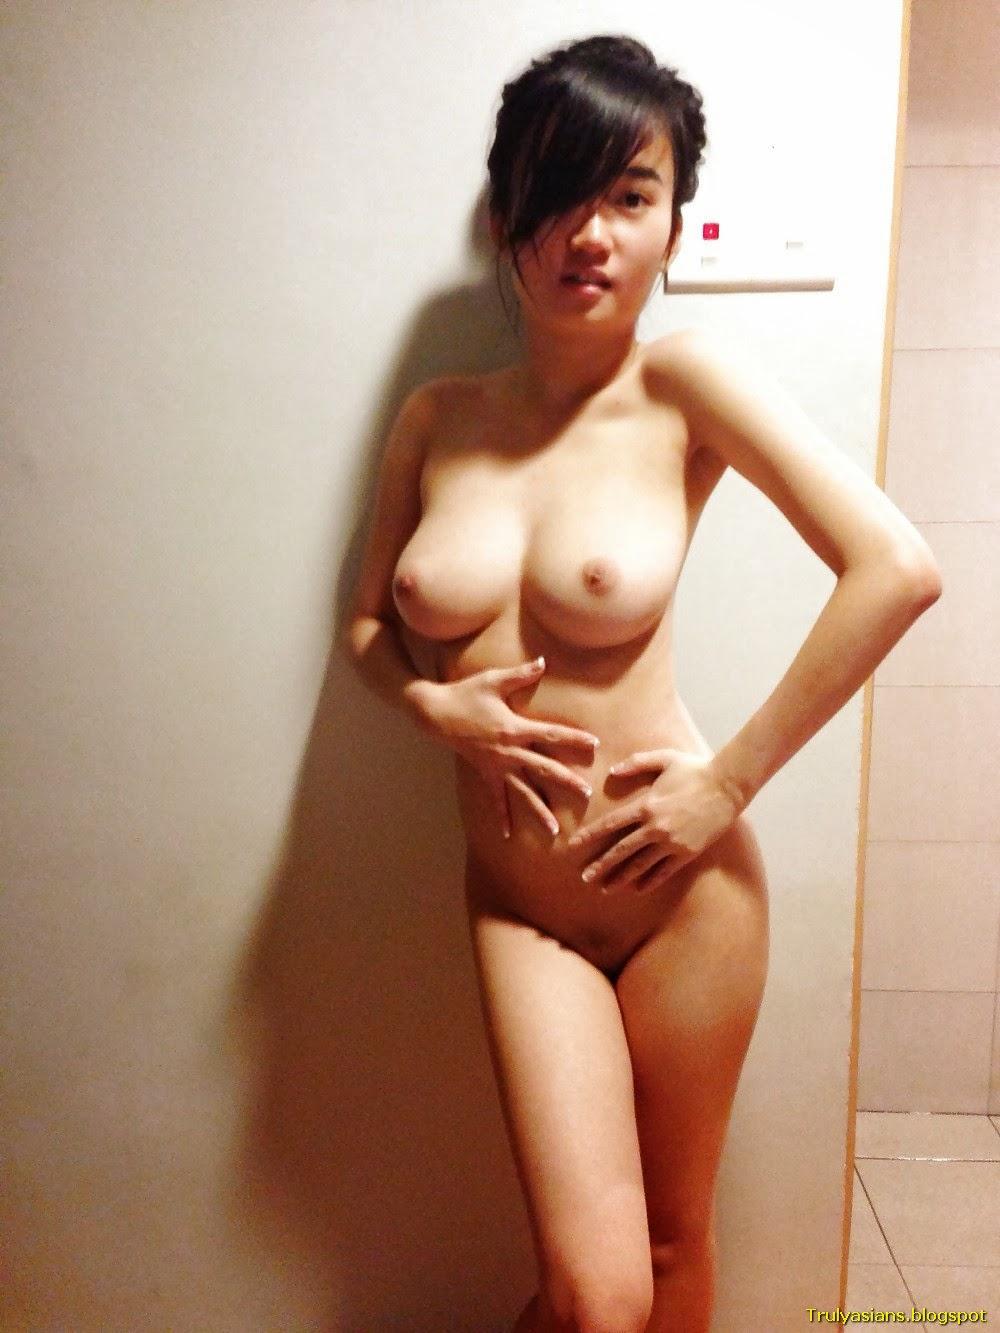 russian-taiwan-sex-girls-photo-rose-porn-nude